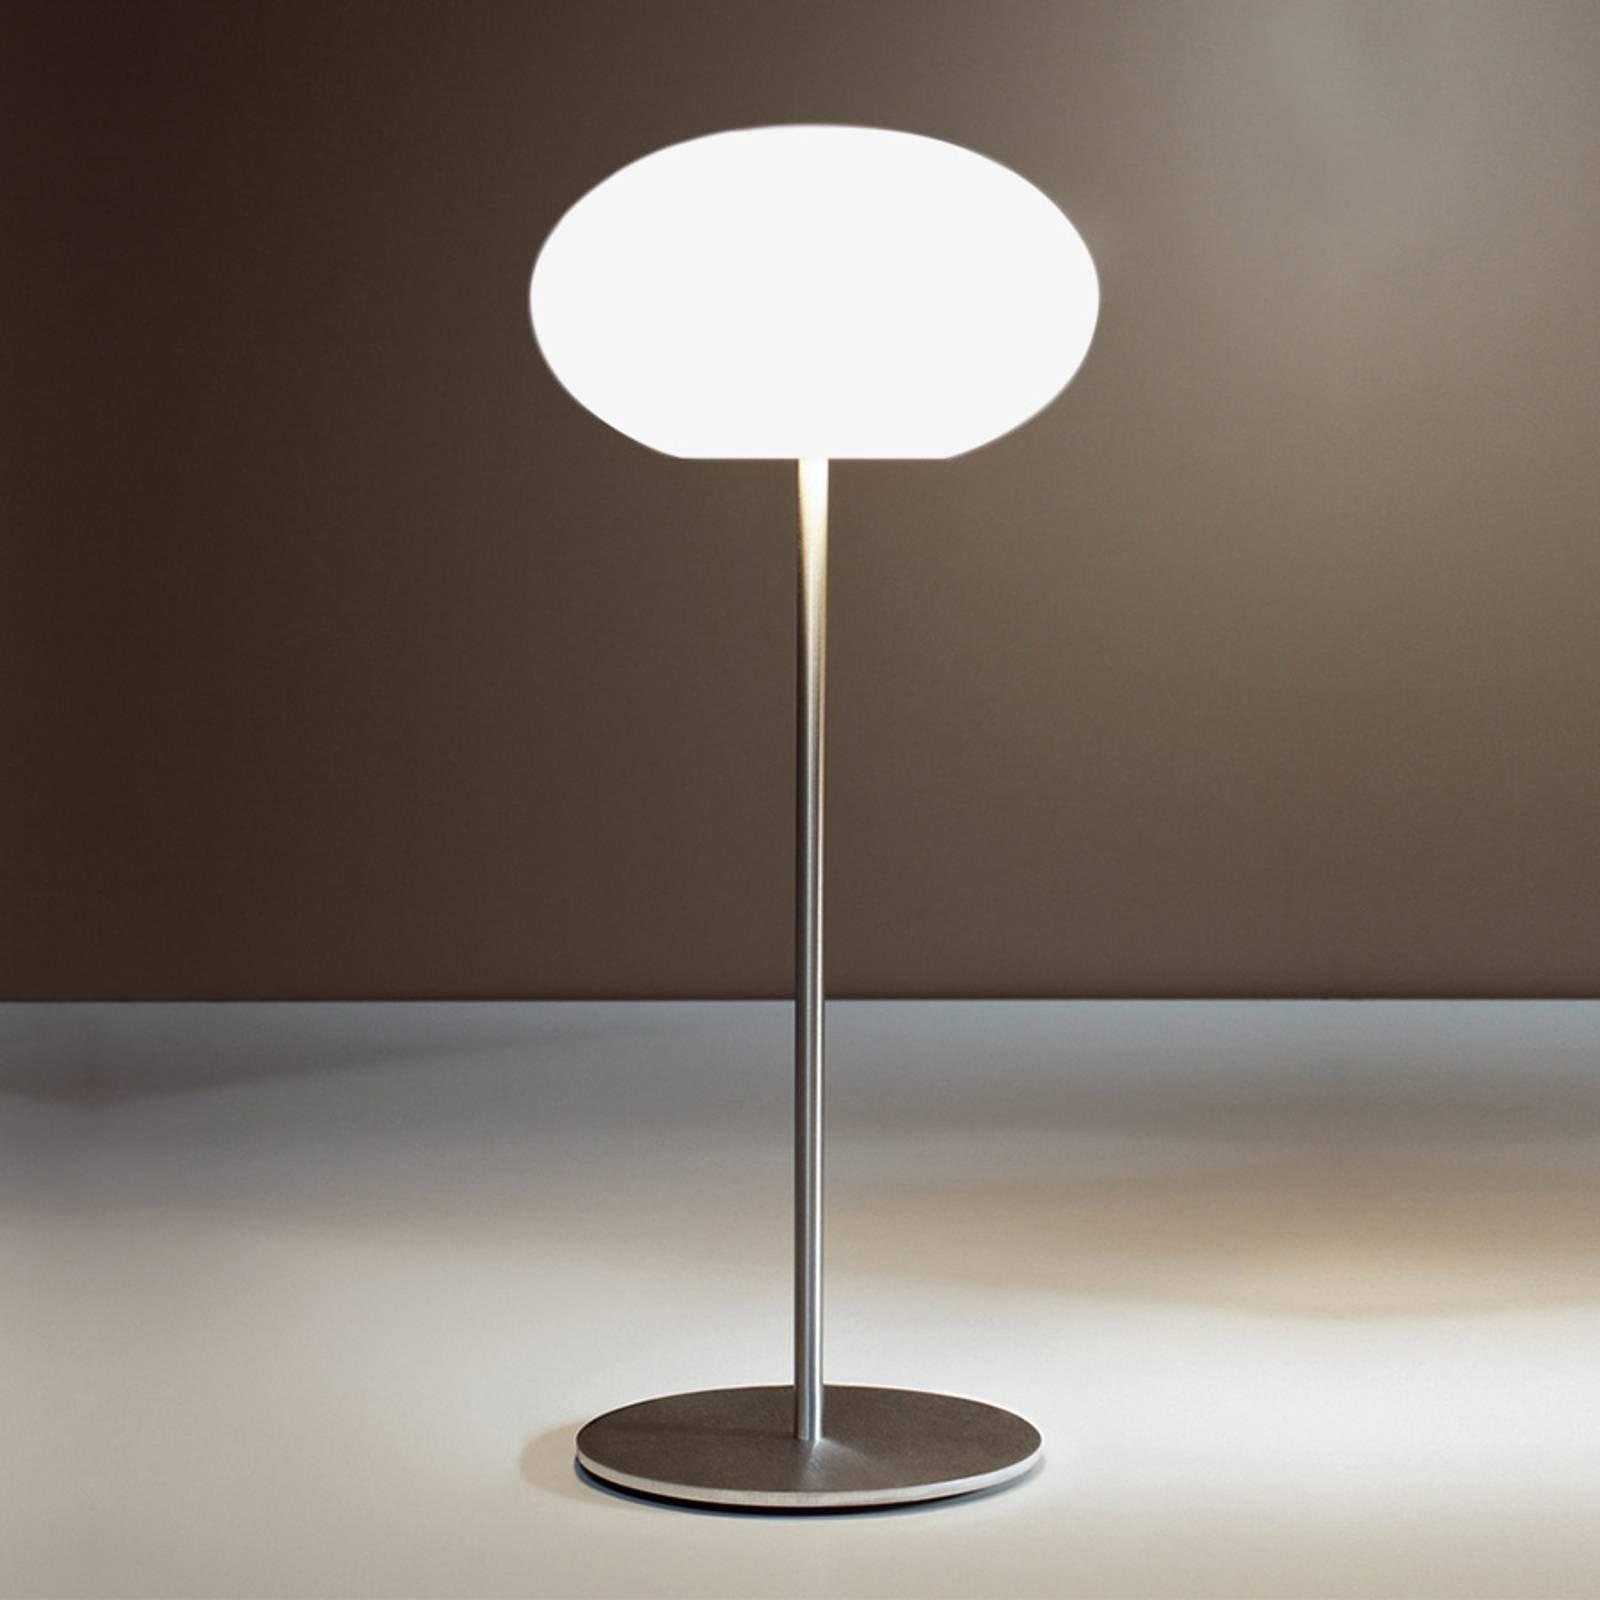 Casablanca Aih bordlampe, Ø 19 cm hvit matt